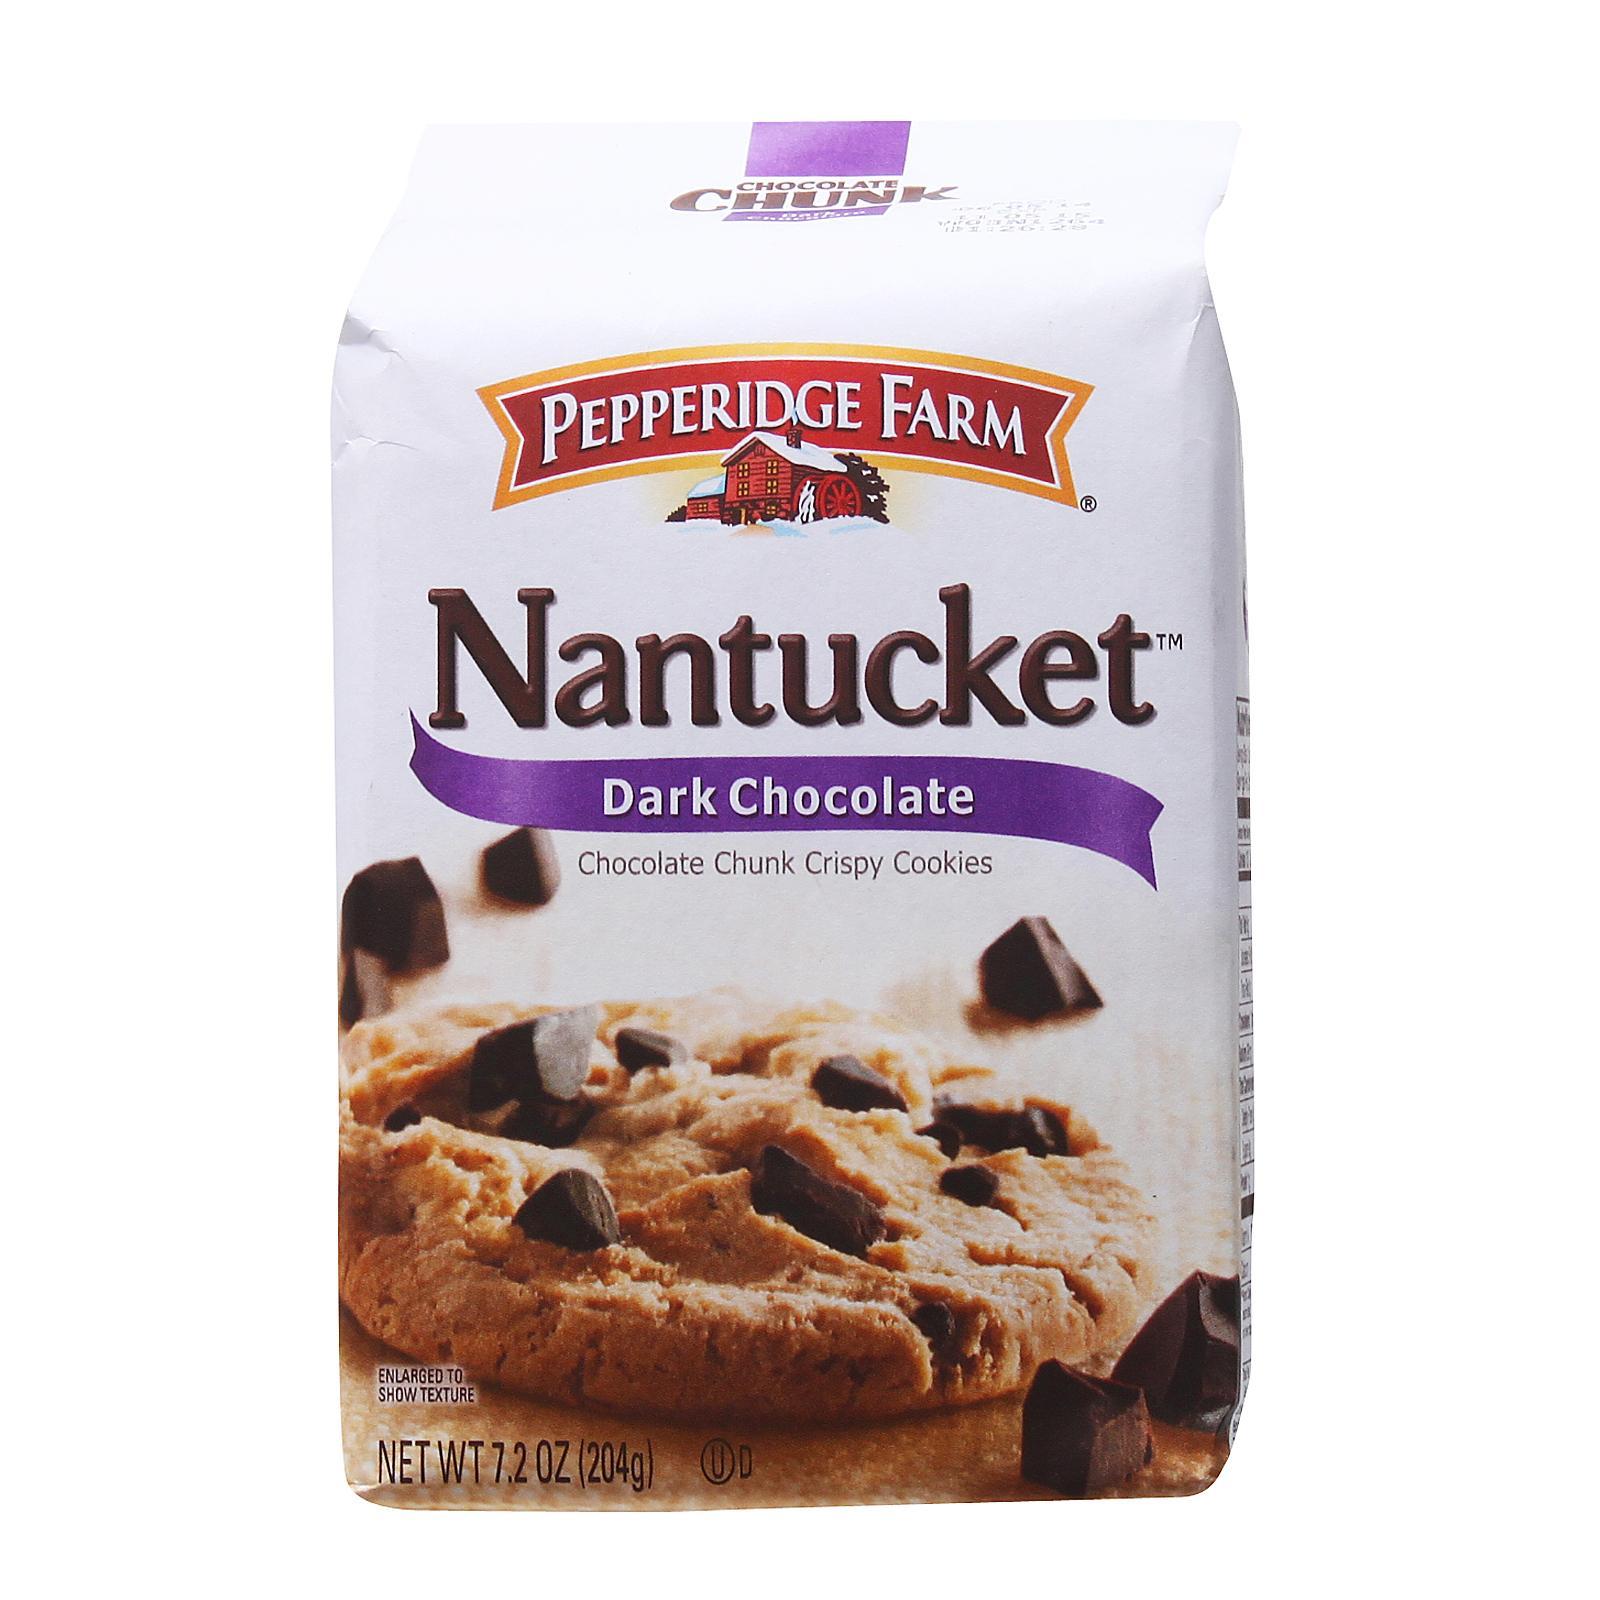 Pepperidge Farm Nantucket Dark Choc Chips American Cookies Lazada Singapore